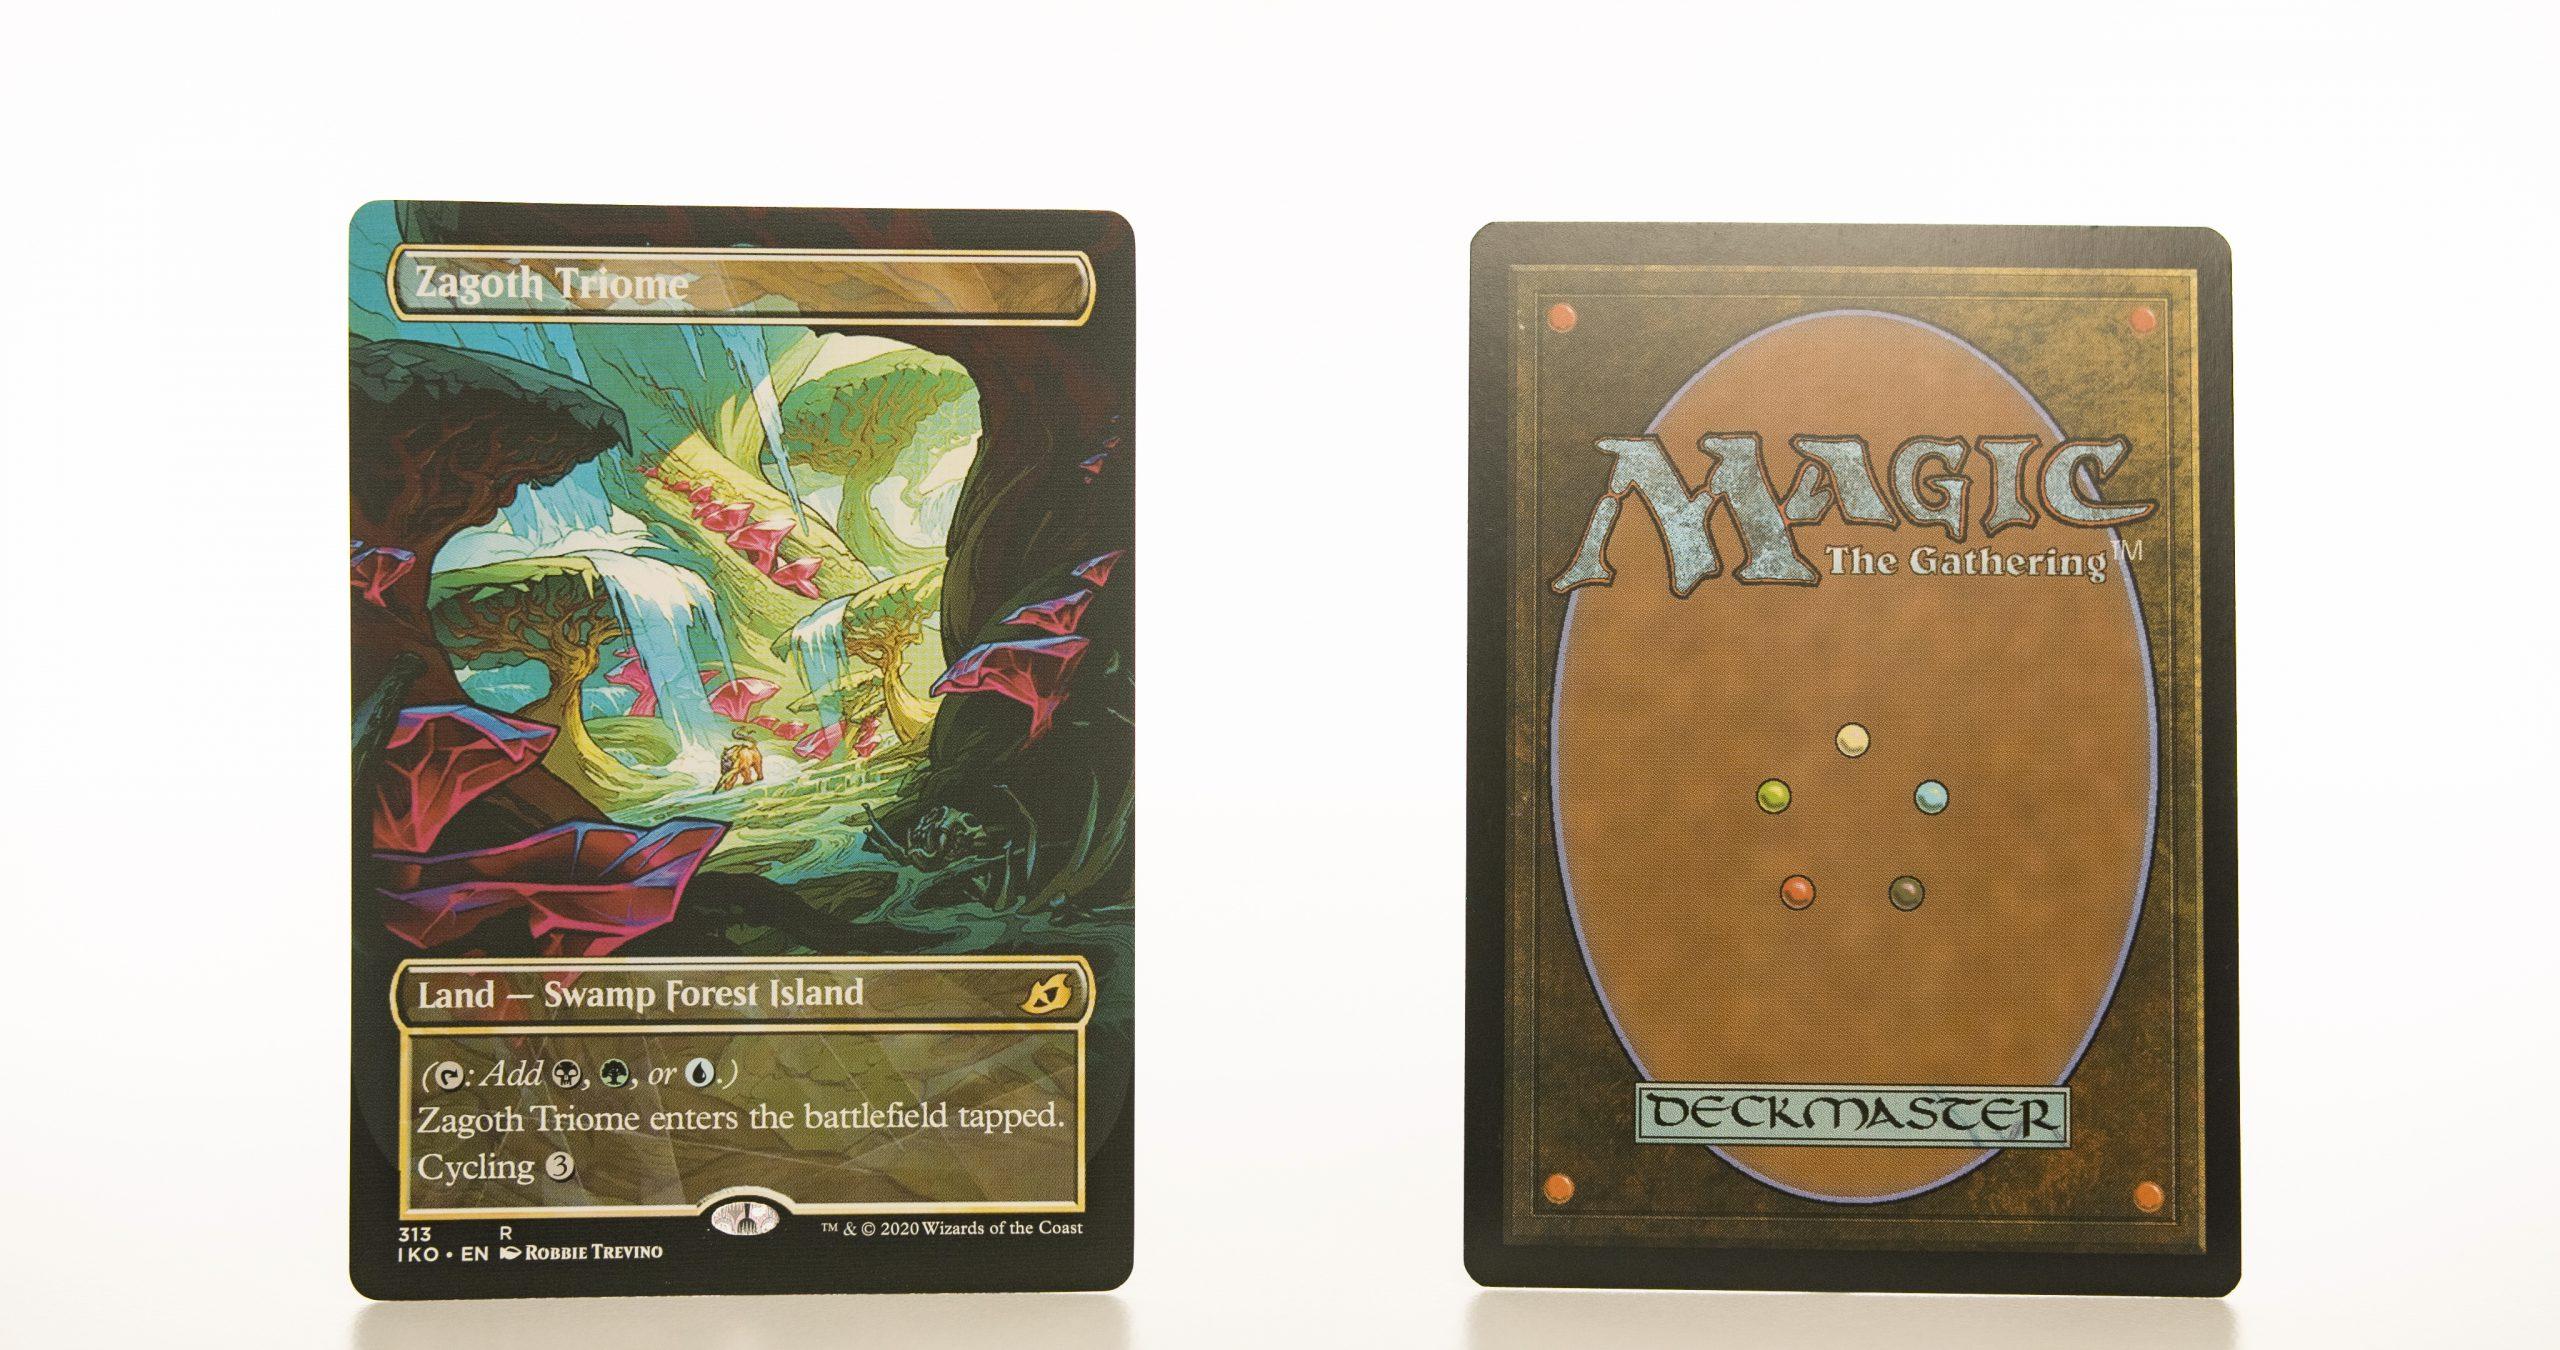 Zagoth Triome Full Art Ikoria: Lair of Behemoths (IKO) hologram mtg proxy magic the gathering tournament proxies GP FNM available